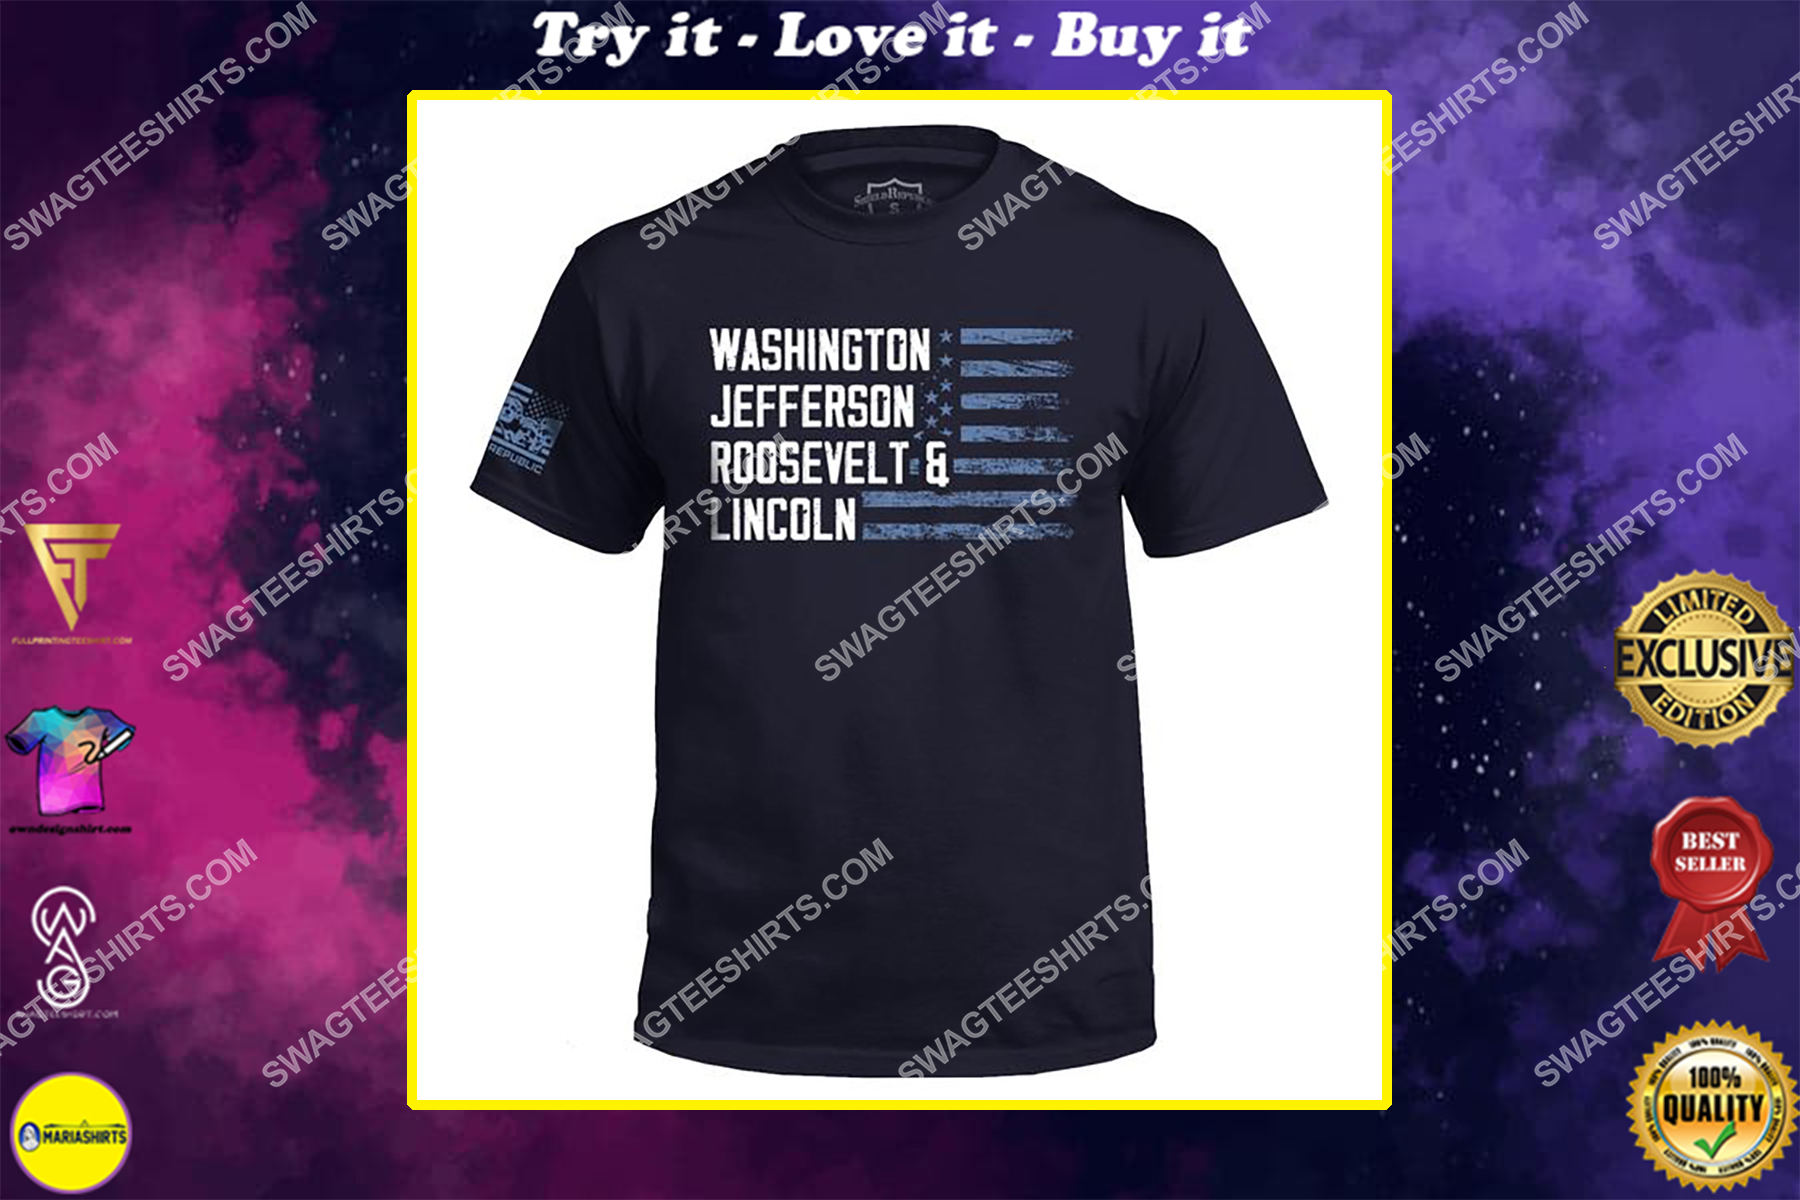 washington jefferson roosevelt and lincoln political shirt